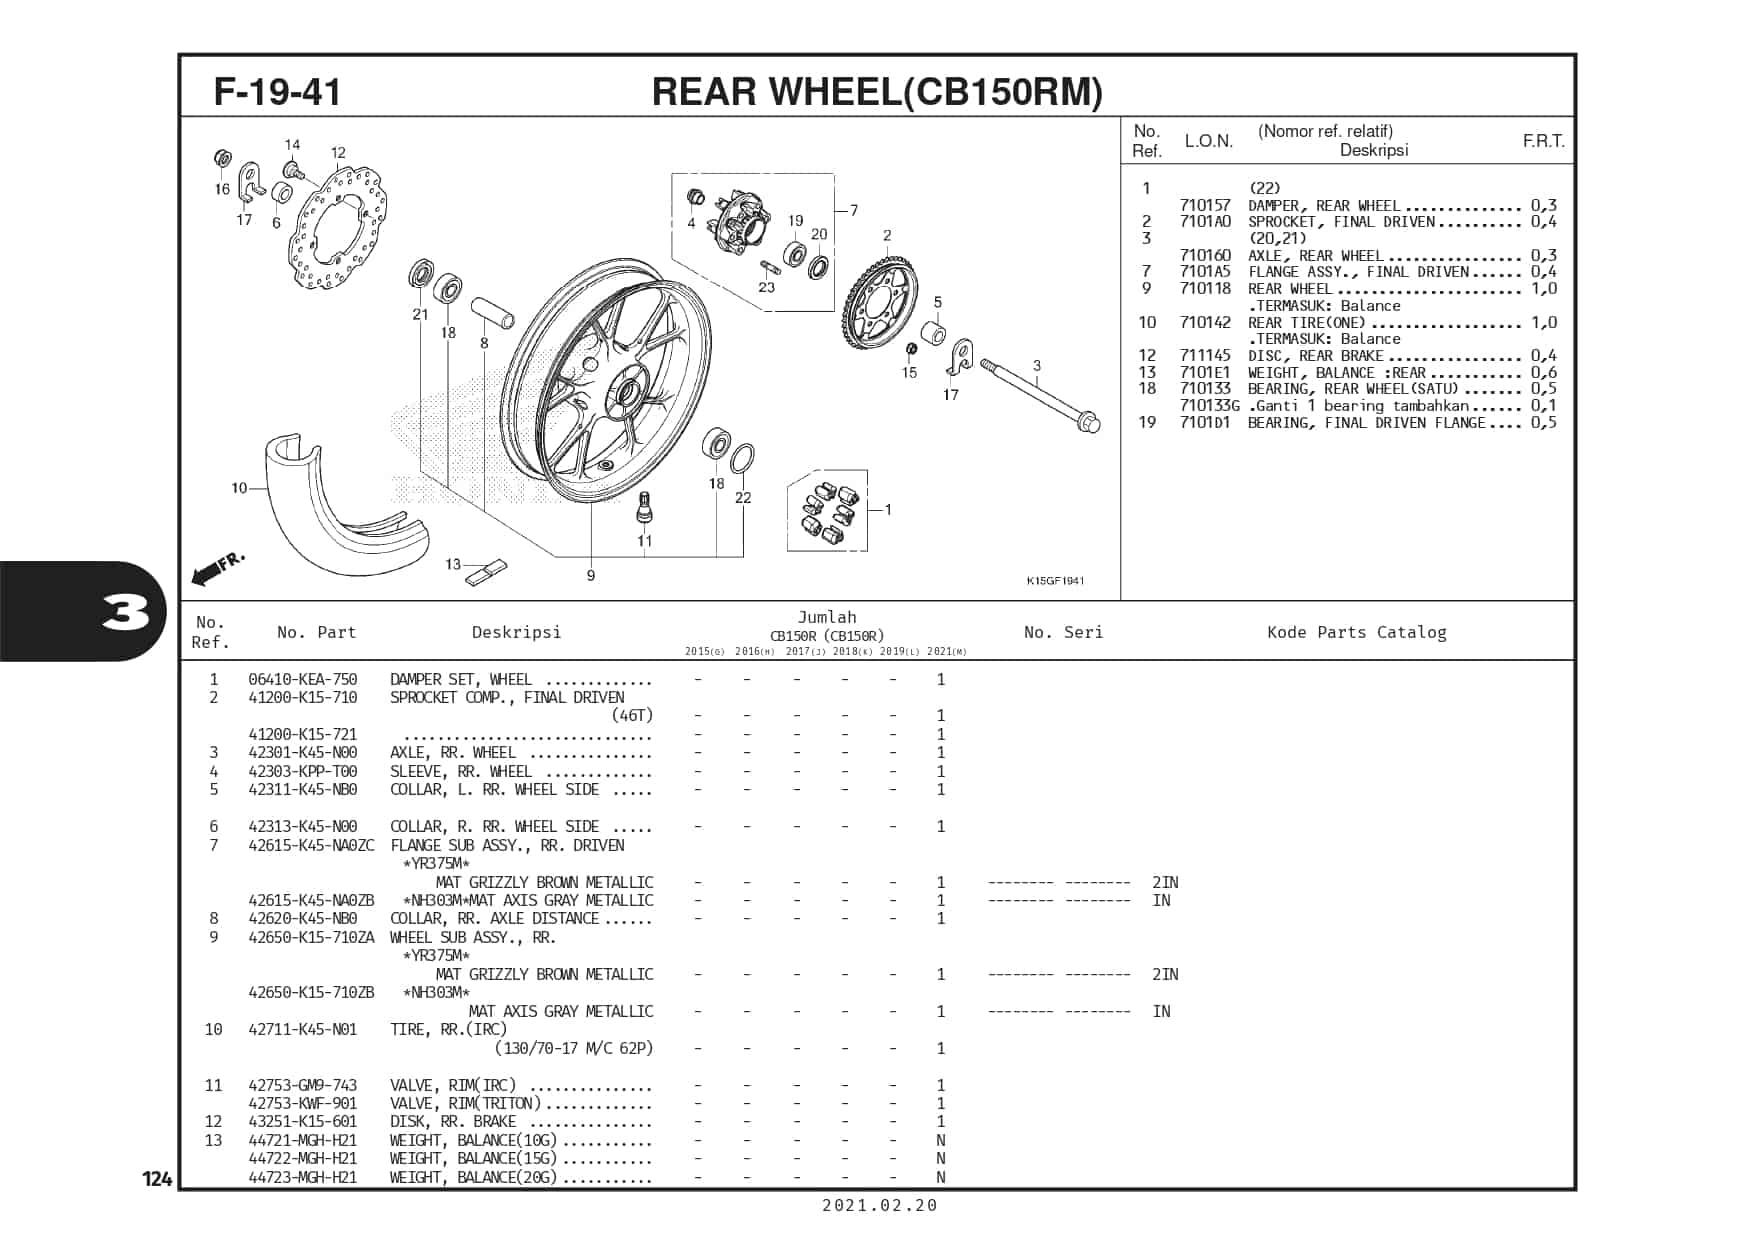 F-19-41 Rear Wheel (CB150RM)